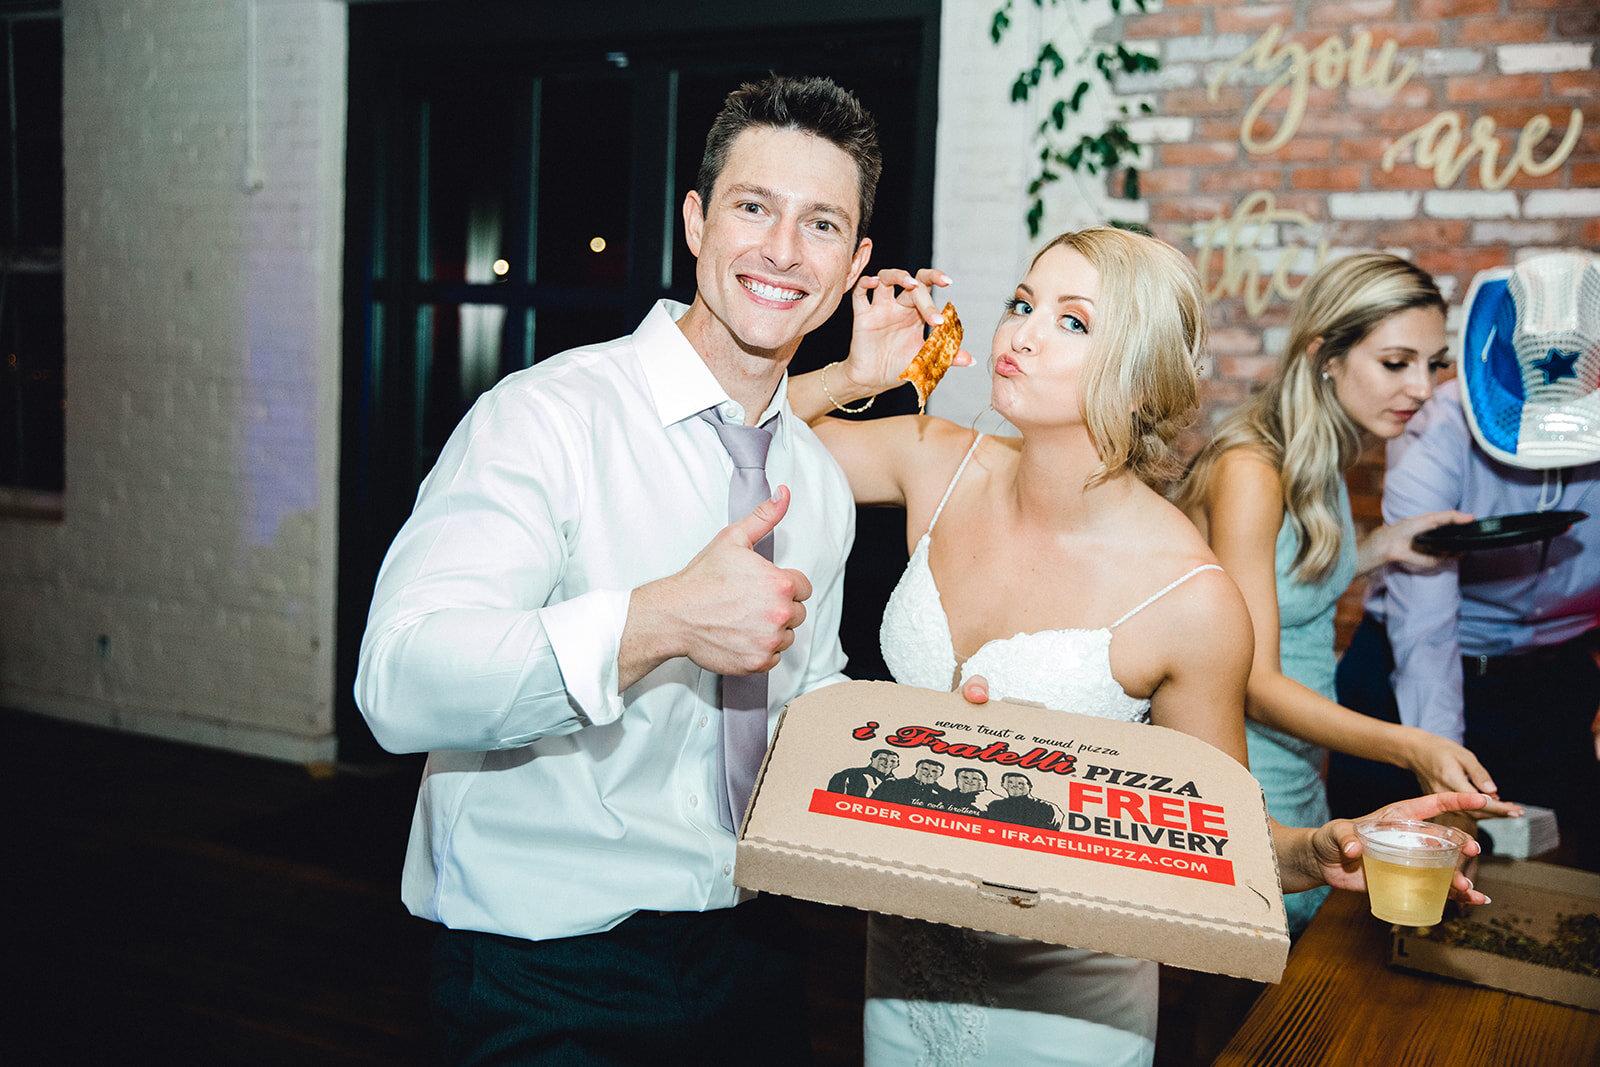 wedding pizza late night snack.jpg